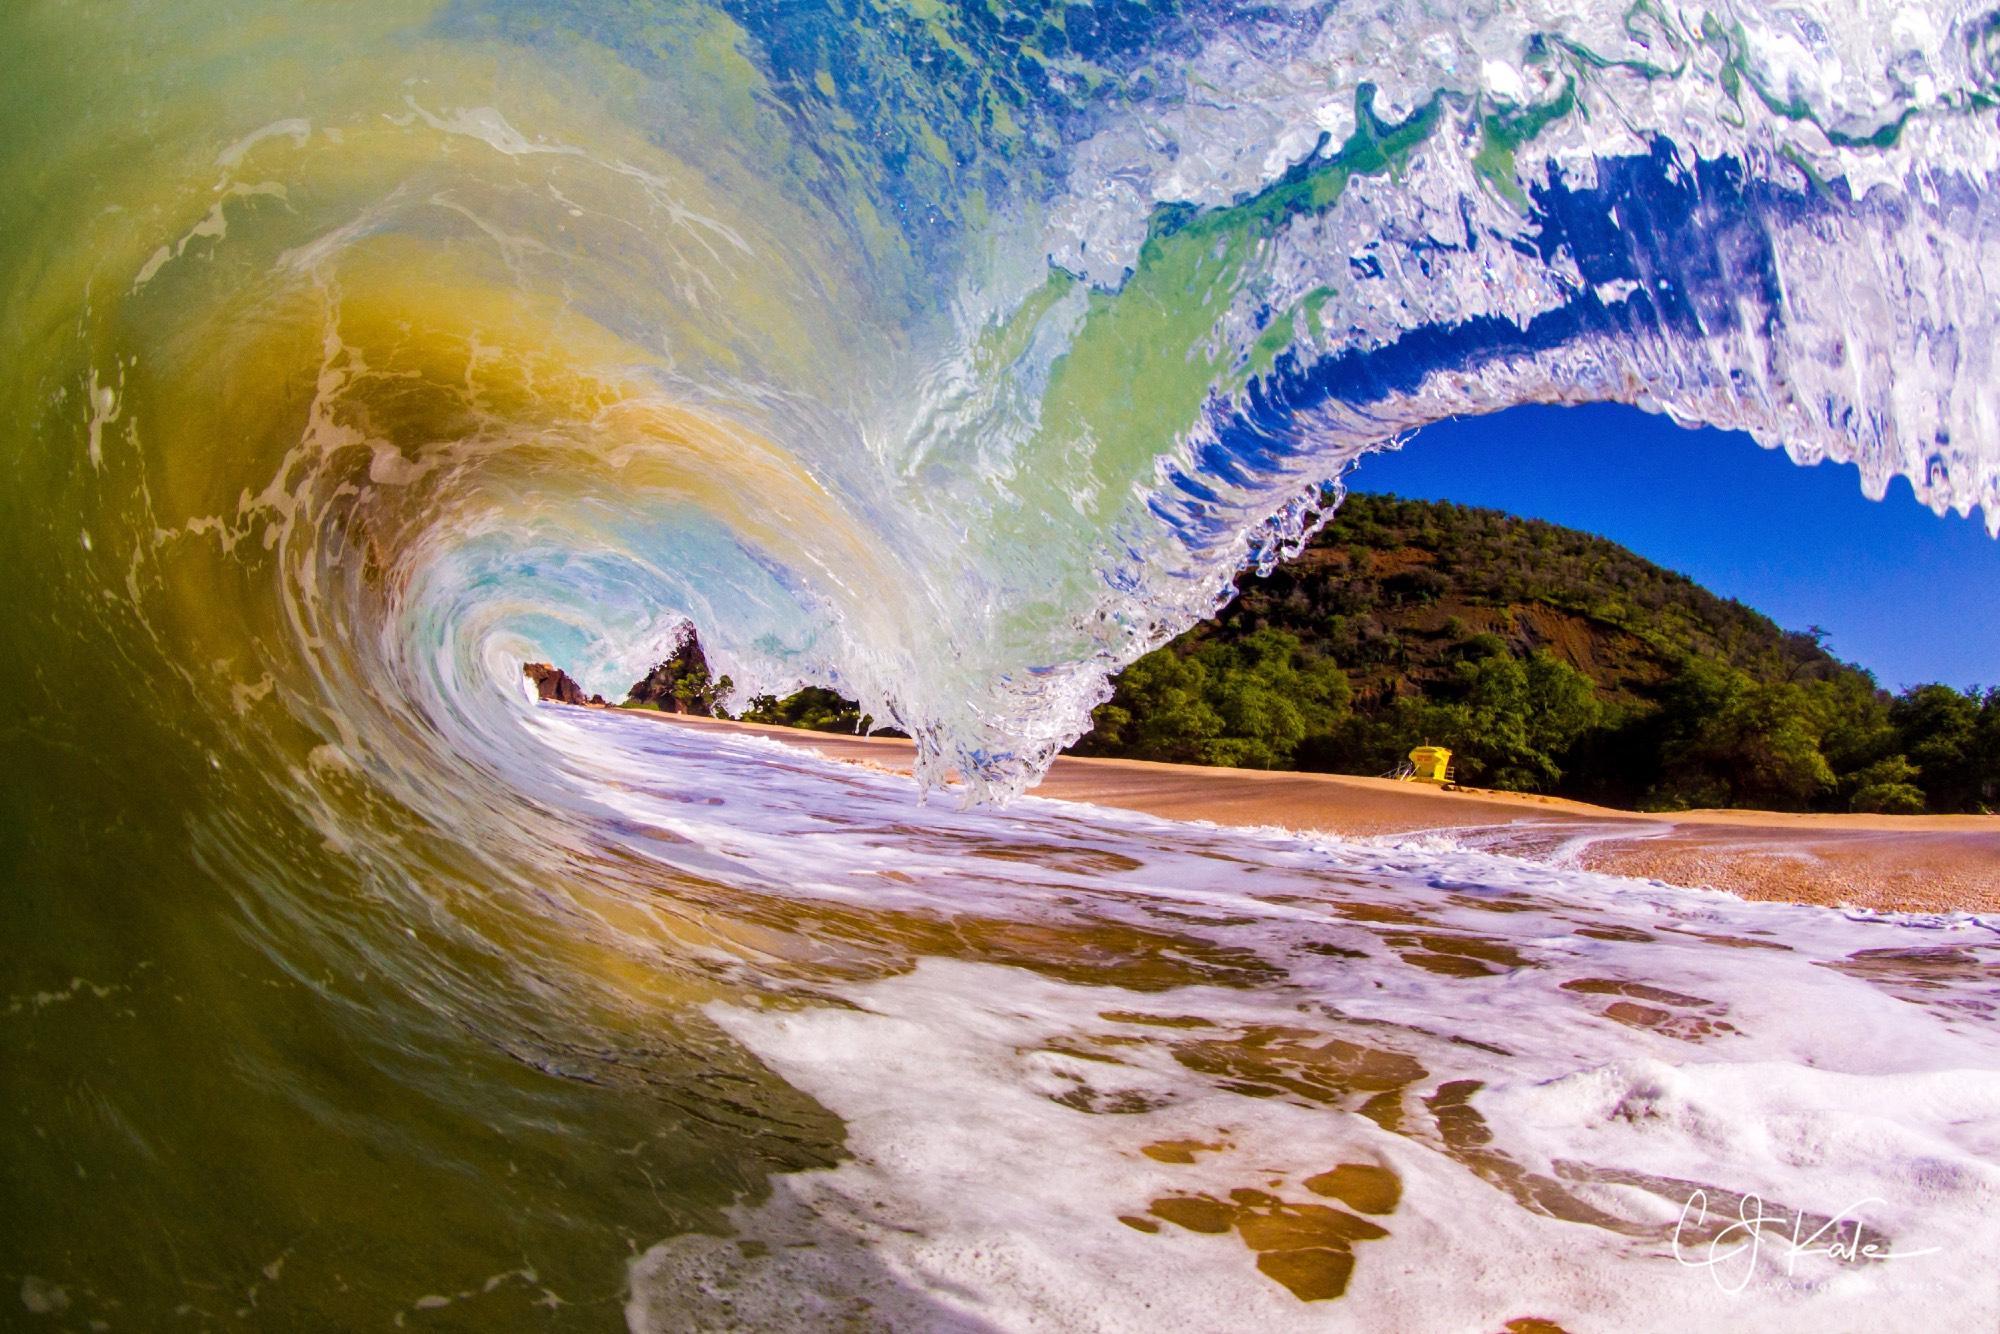 wave, wave photography,, photo